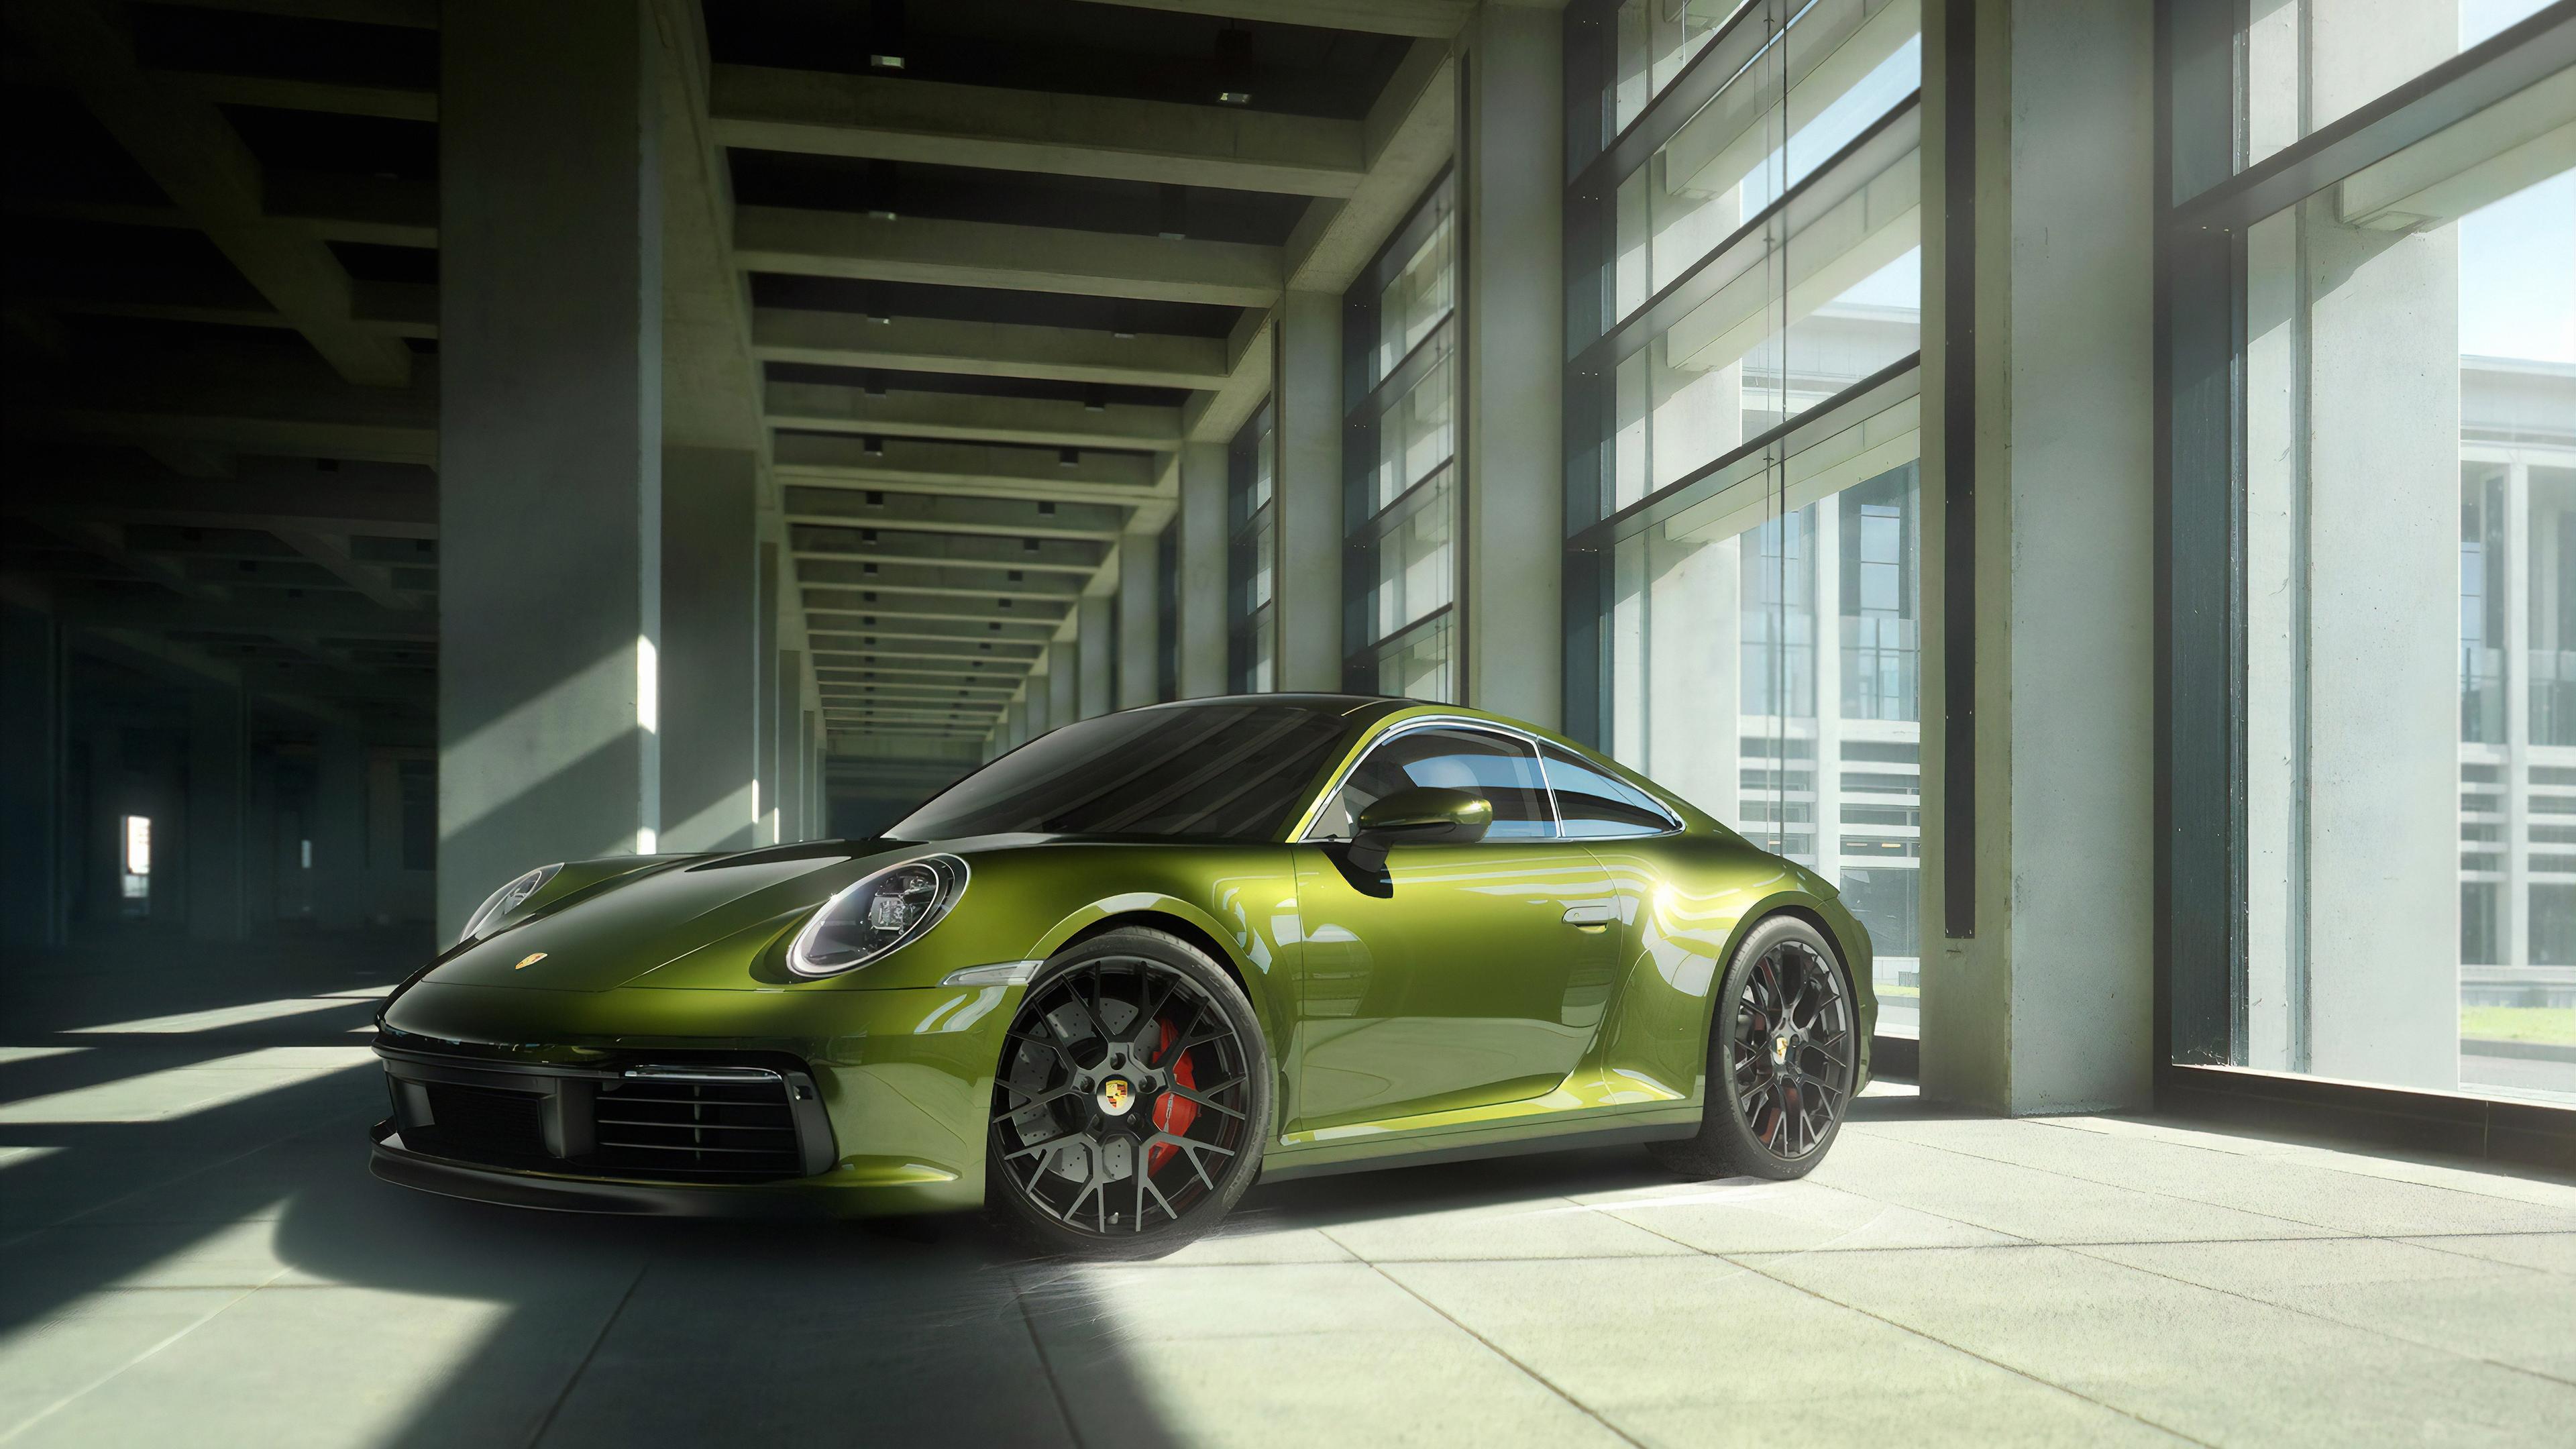 porsche 2019 1565055039 - Porsche 2019 - porsche wallpapers, hd-wallpapers, cars wallpapers, behance wallpapers, 4k-wallpapers